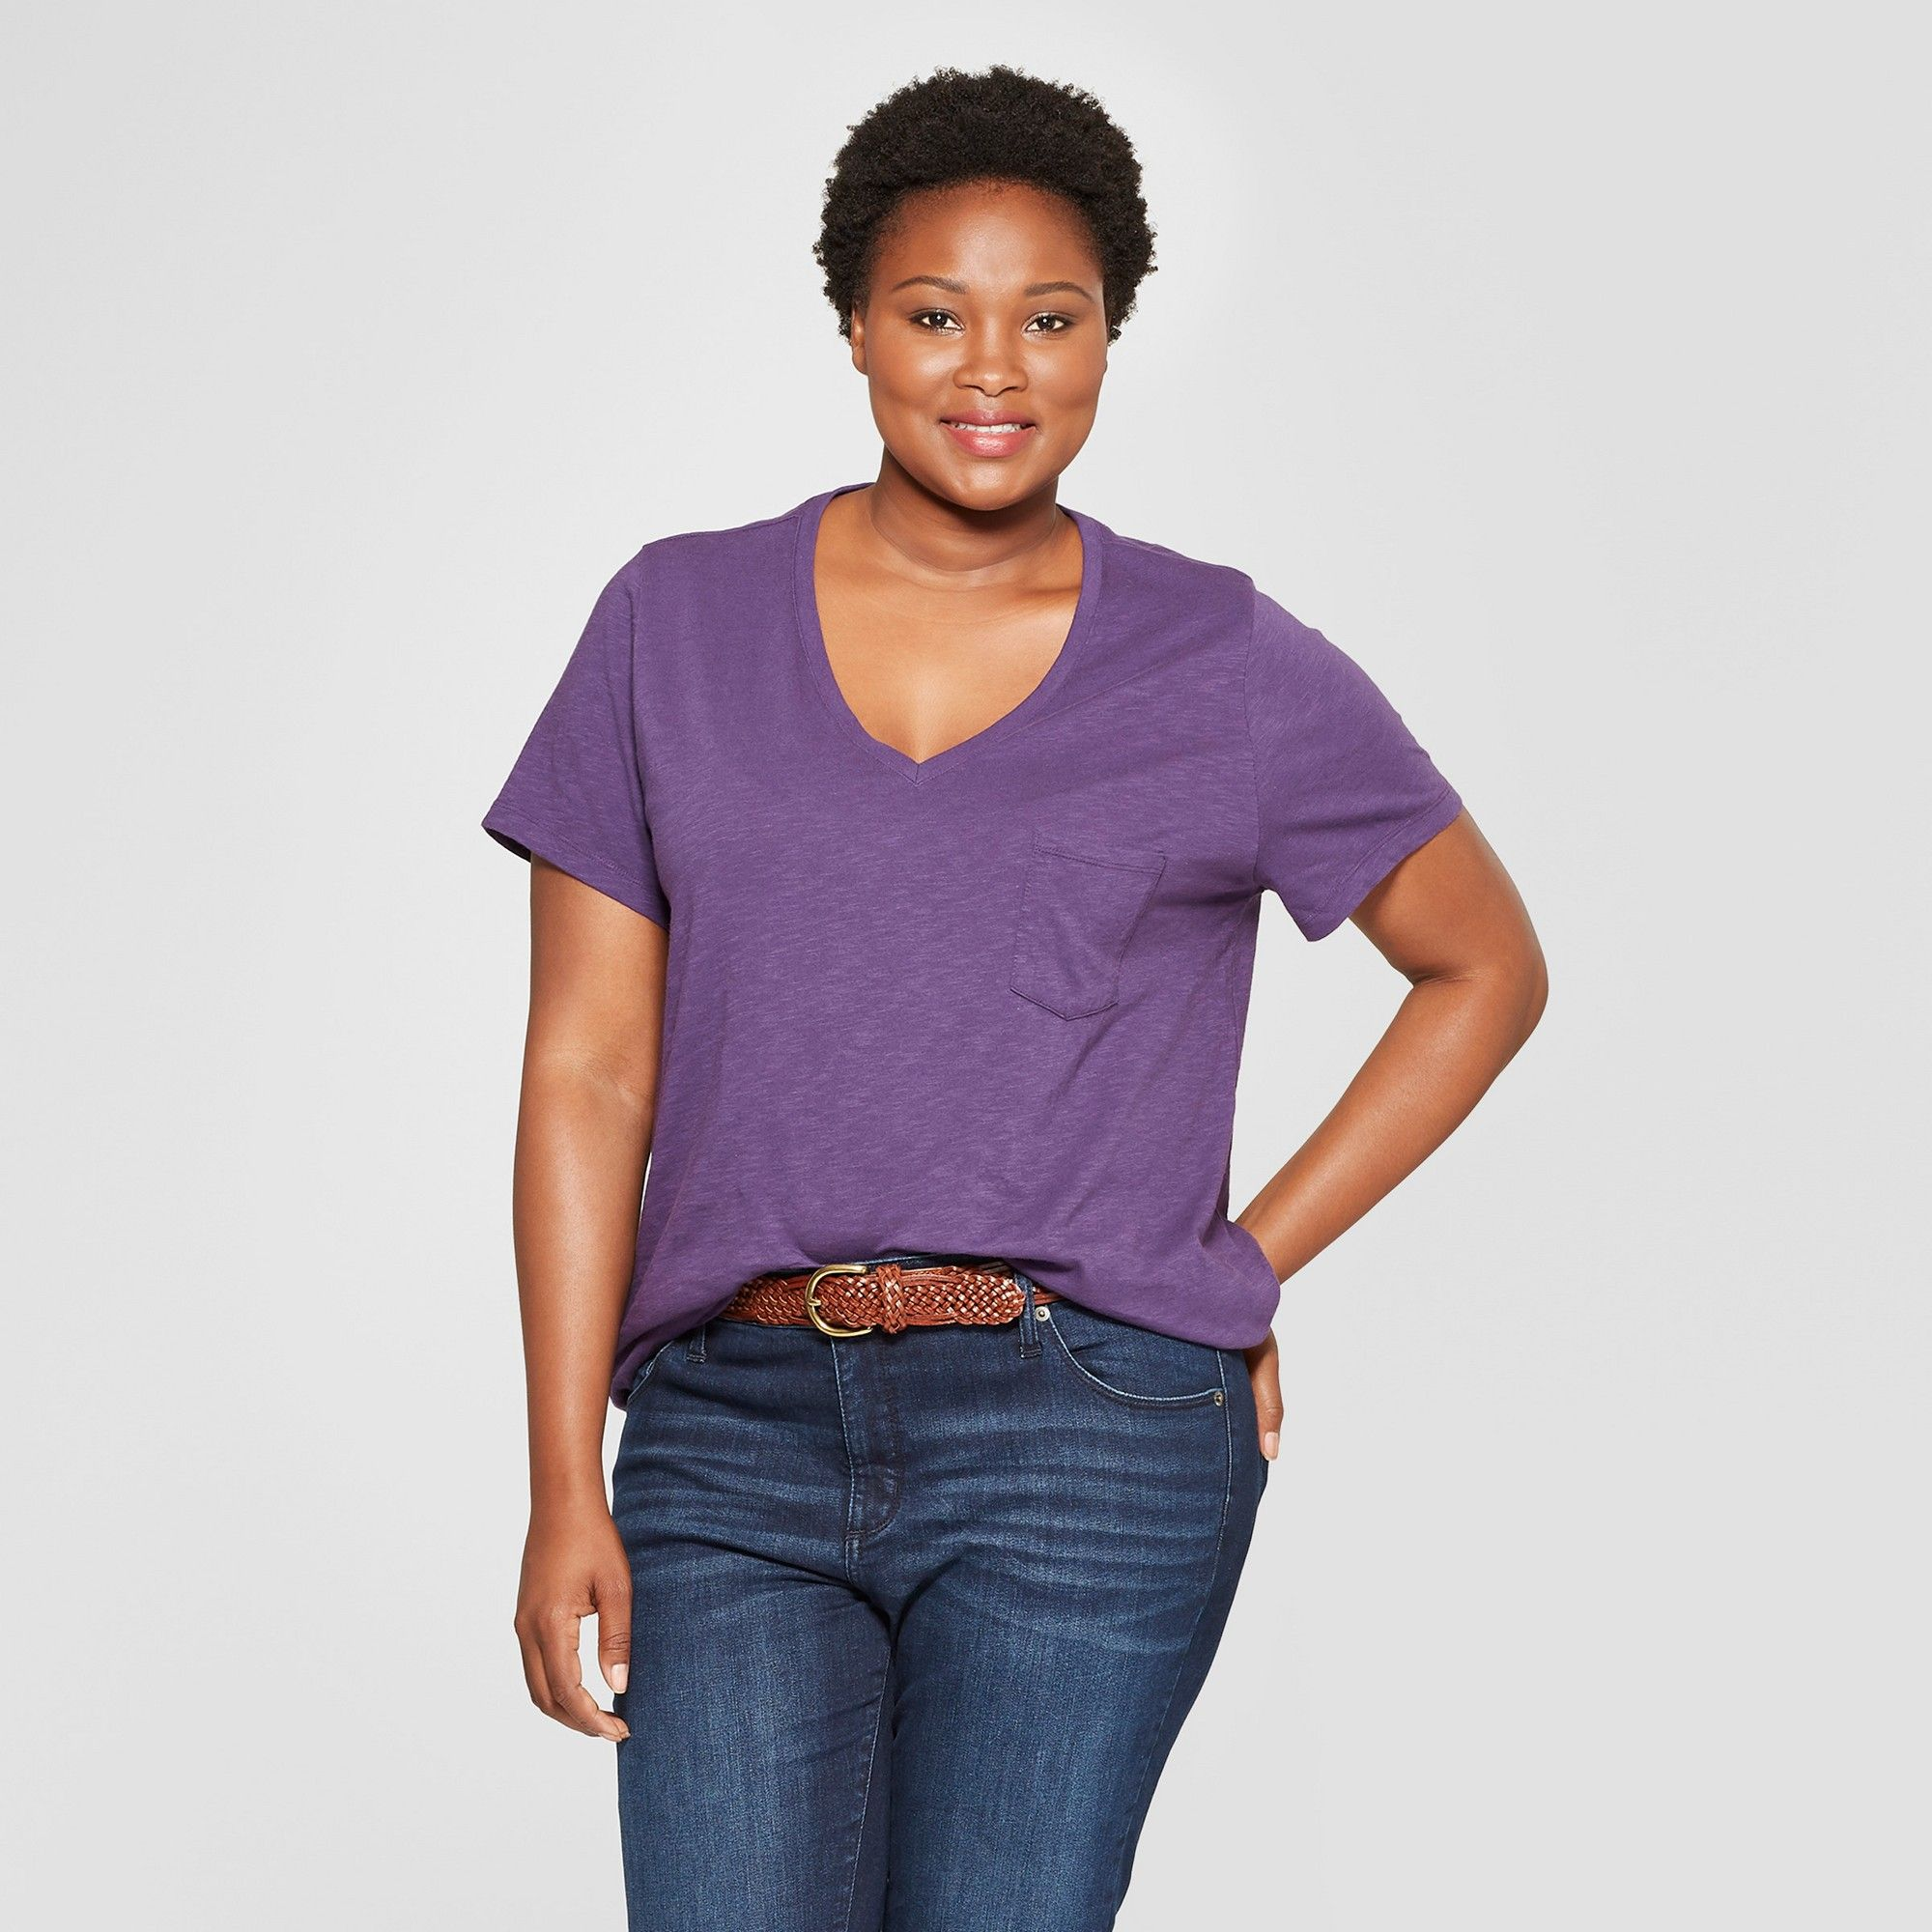 a4ae165678 Women's Plus Size Monterey Pocket V-Neck Short Sleeve T-Shirt ...